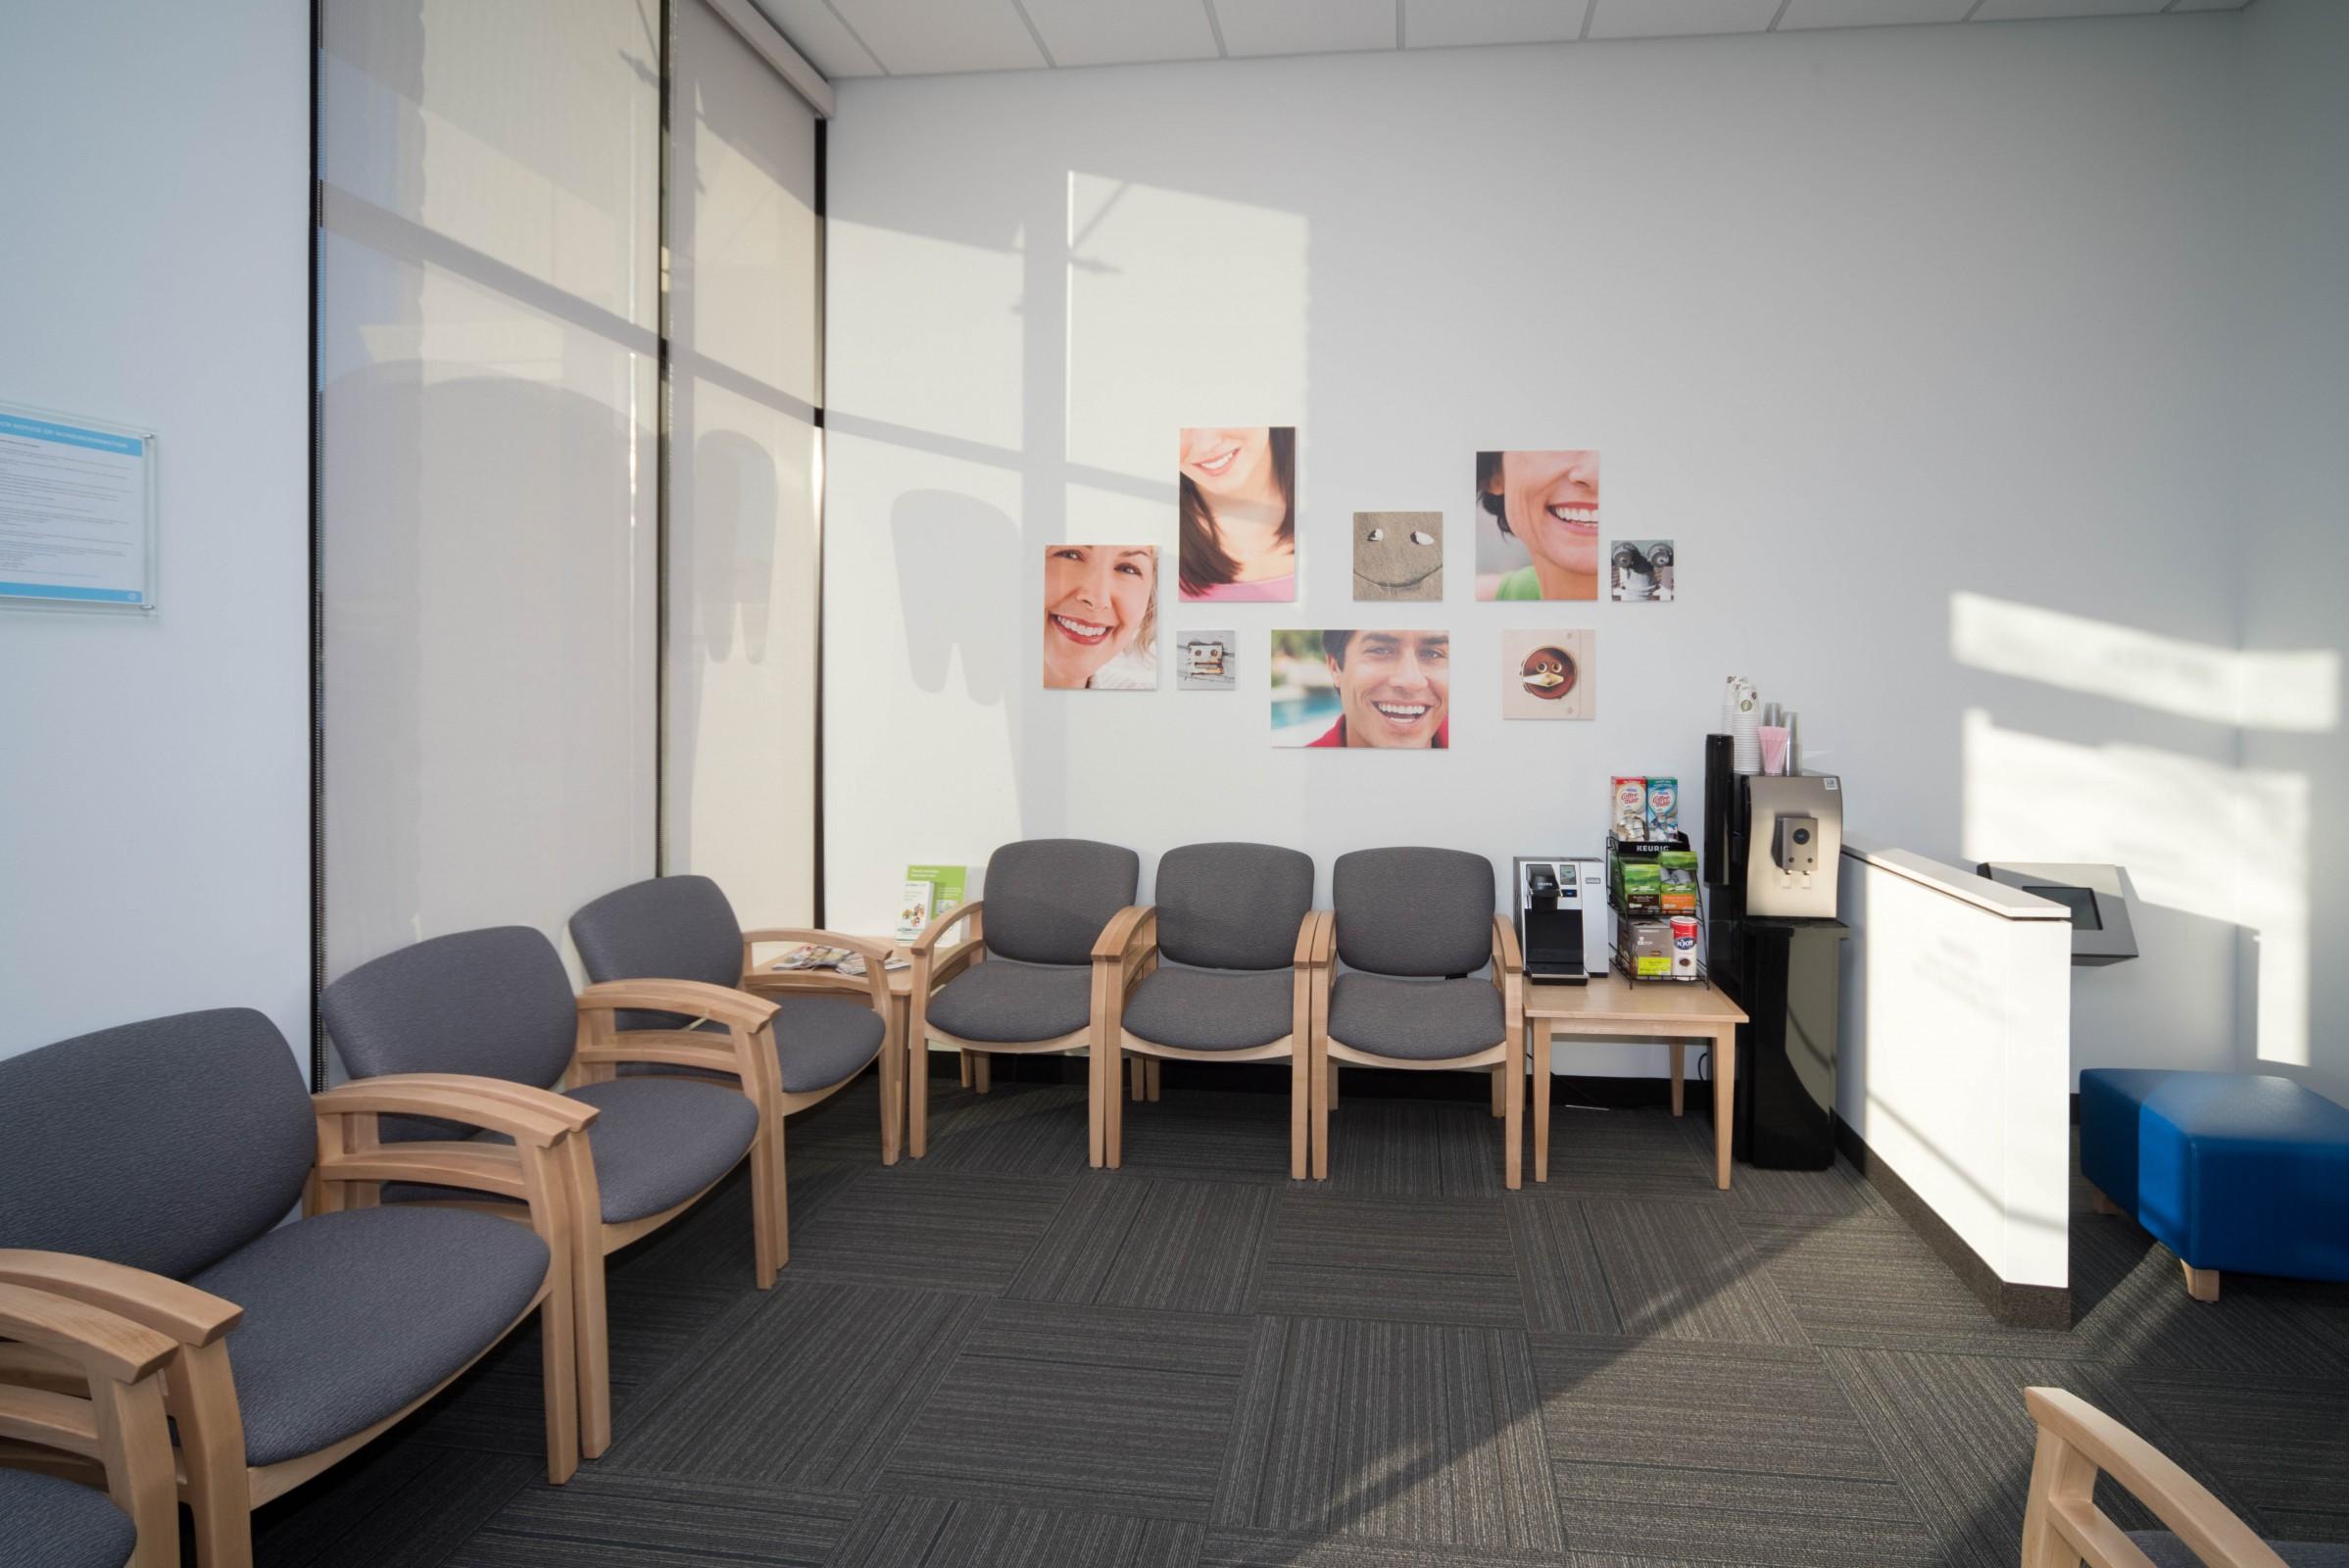 Dentists of Greenwood image 2